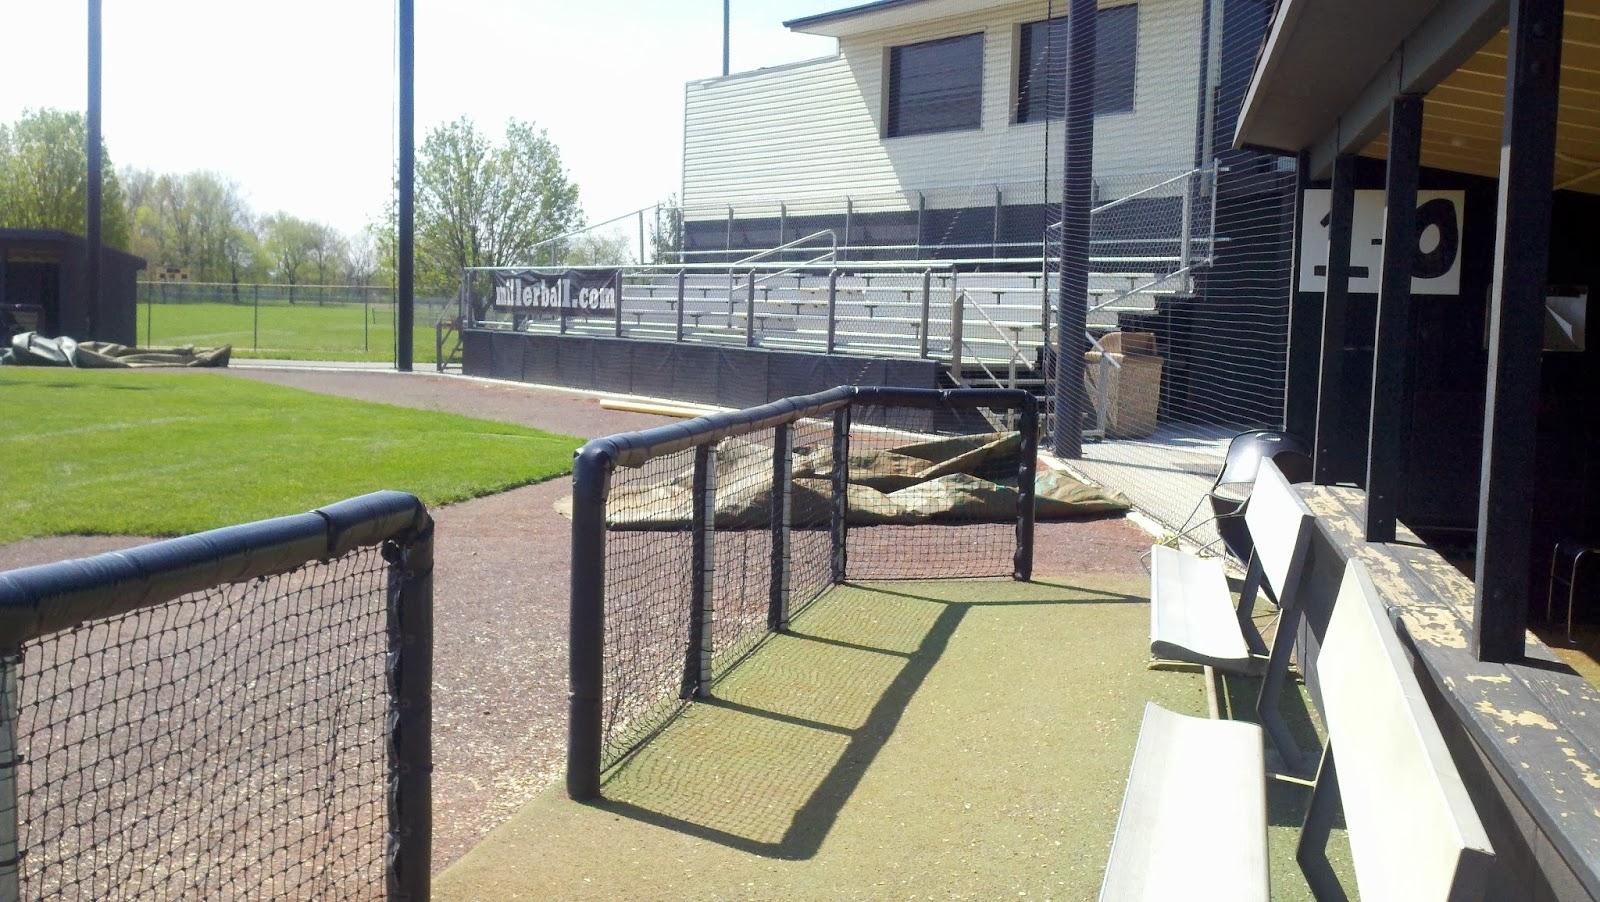 Baseball Dugout Bedroom Designs: Smart Turf: Baseball Field Dugout Designs And Layout